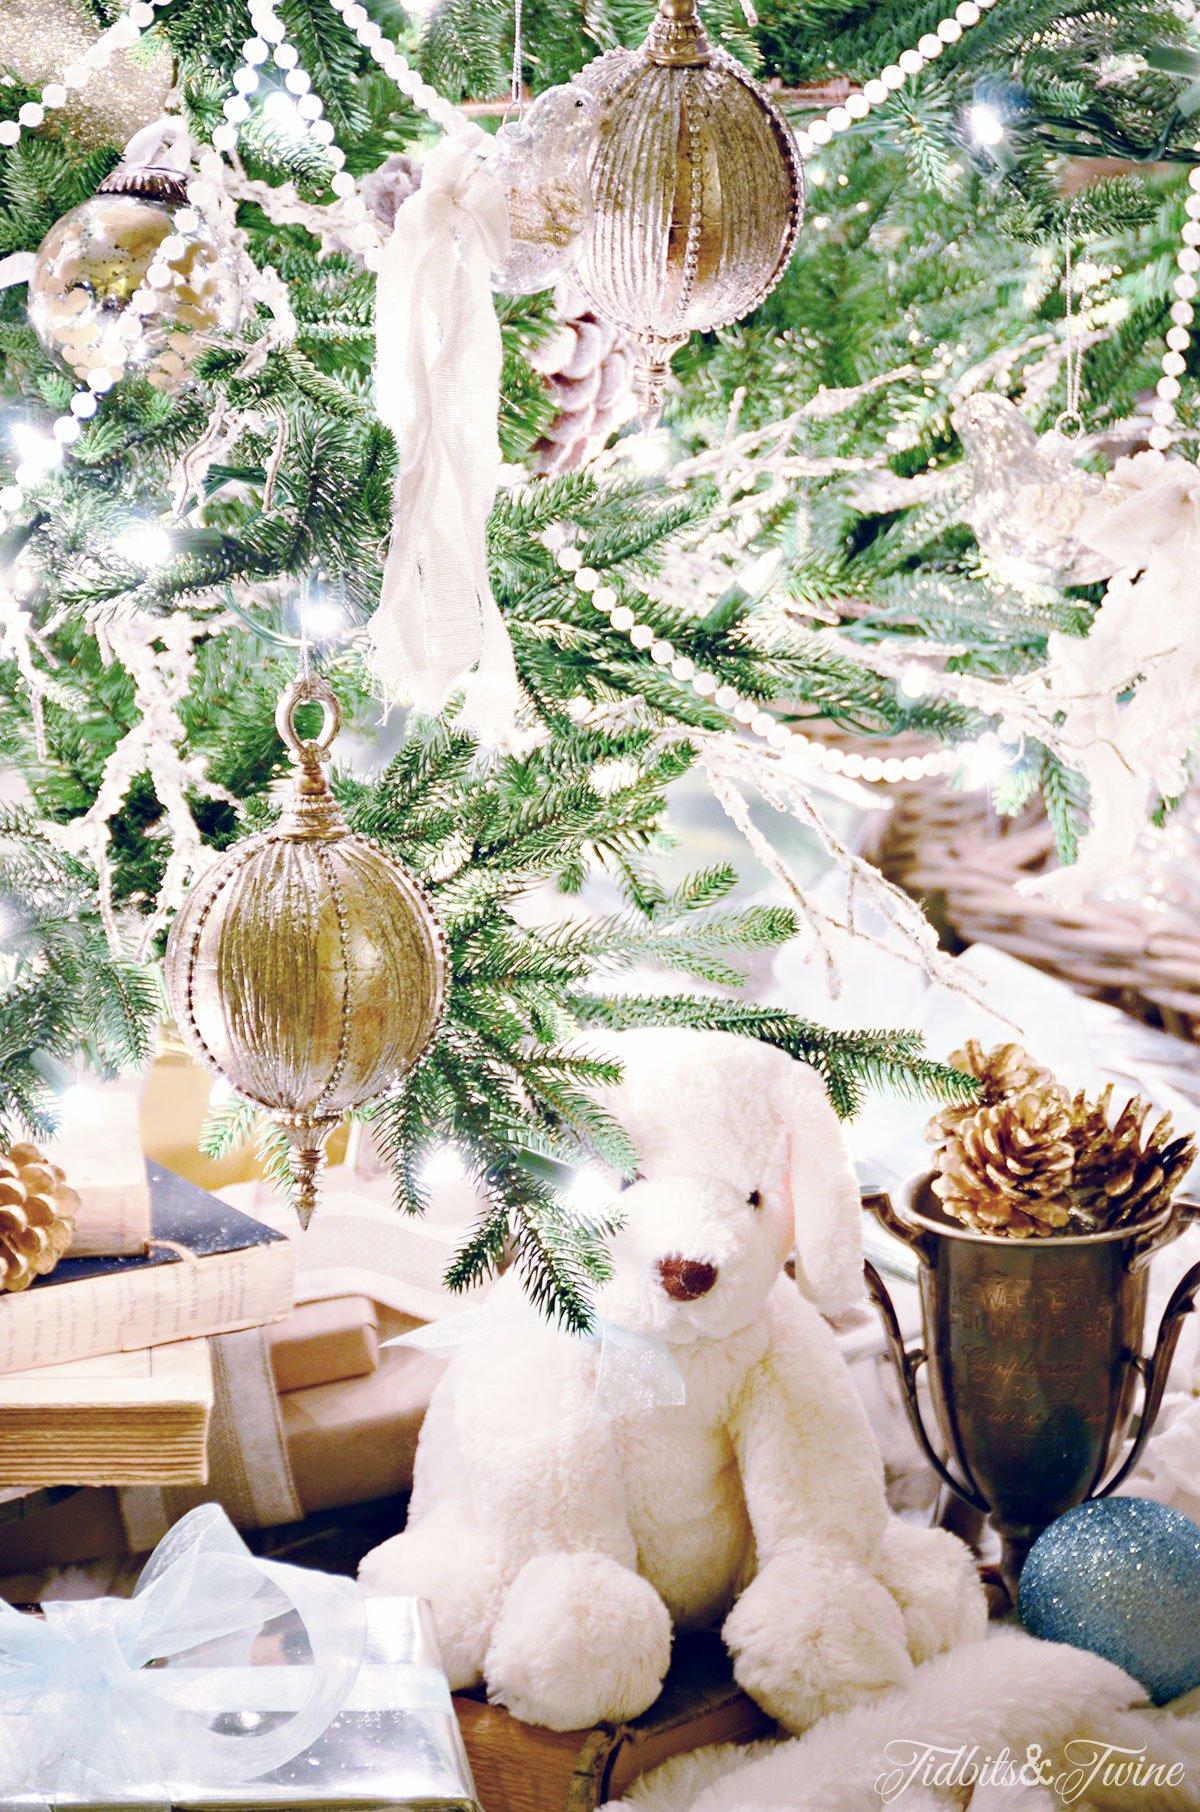 TIDBITS&TWINE-Christmas-Tree-2015-Presents